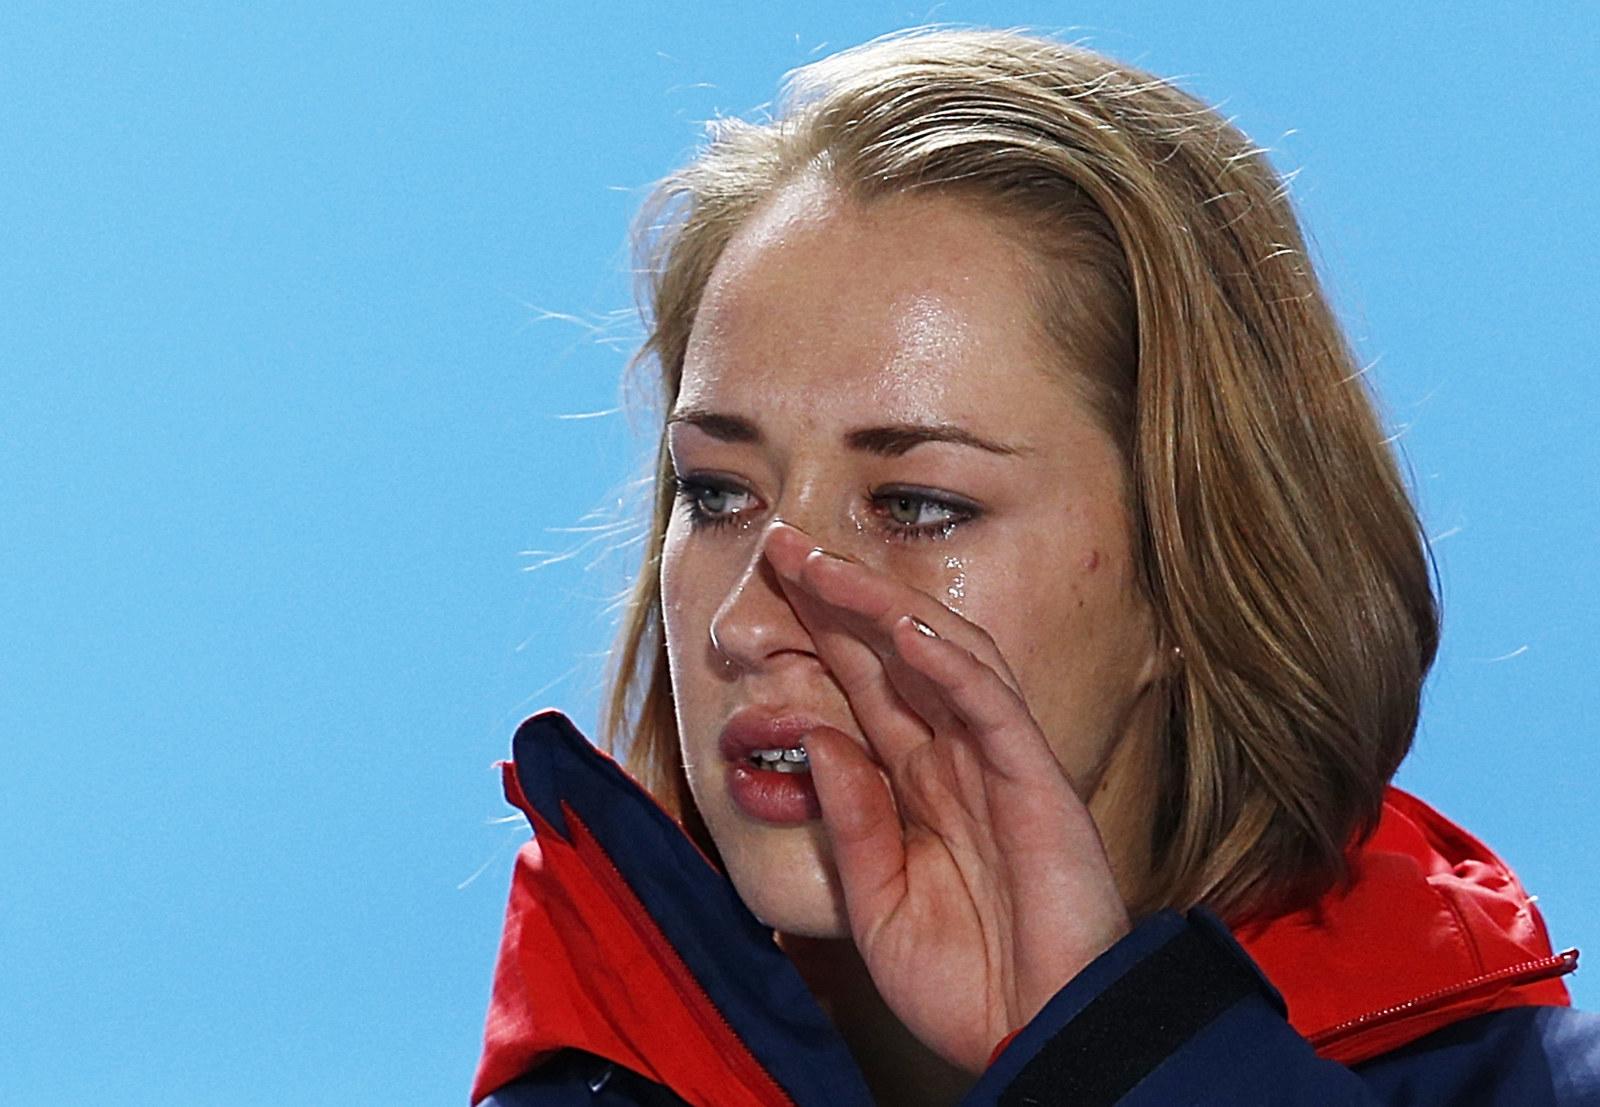 sub-buzz-24311-1470194520-5 12 Athletes Crying Tears Of Joy To Make You Feel Feelings